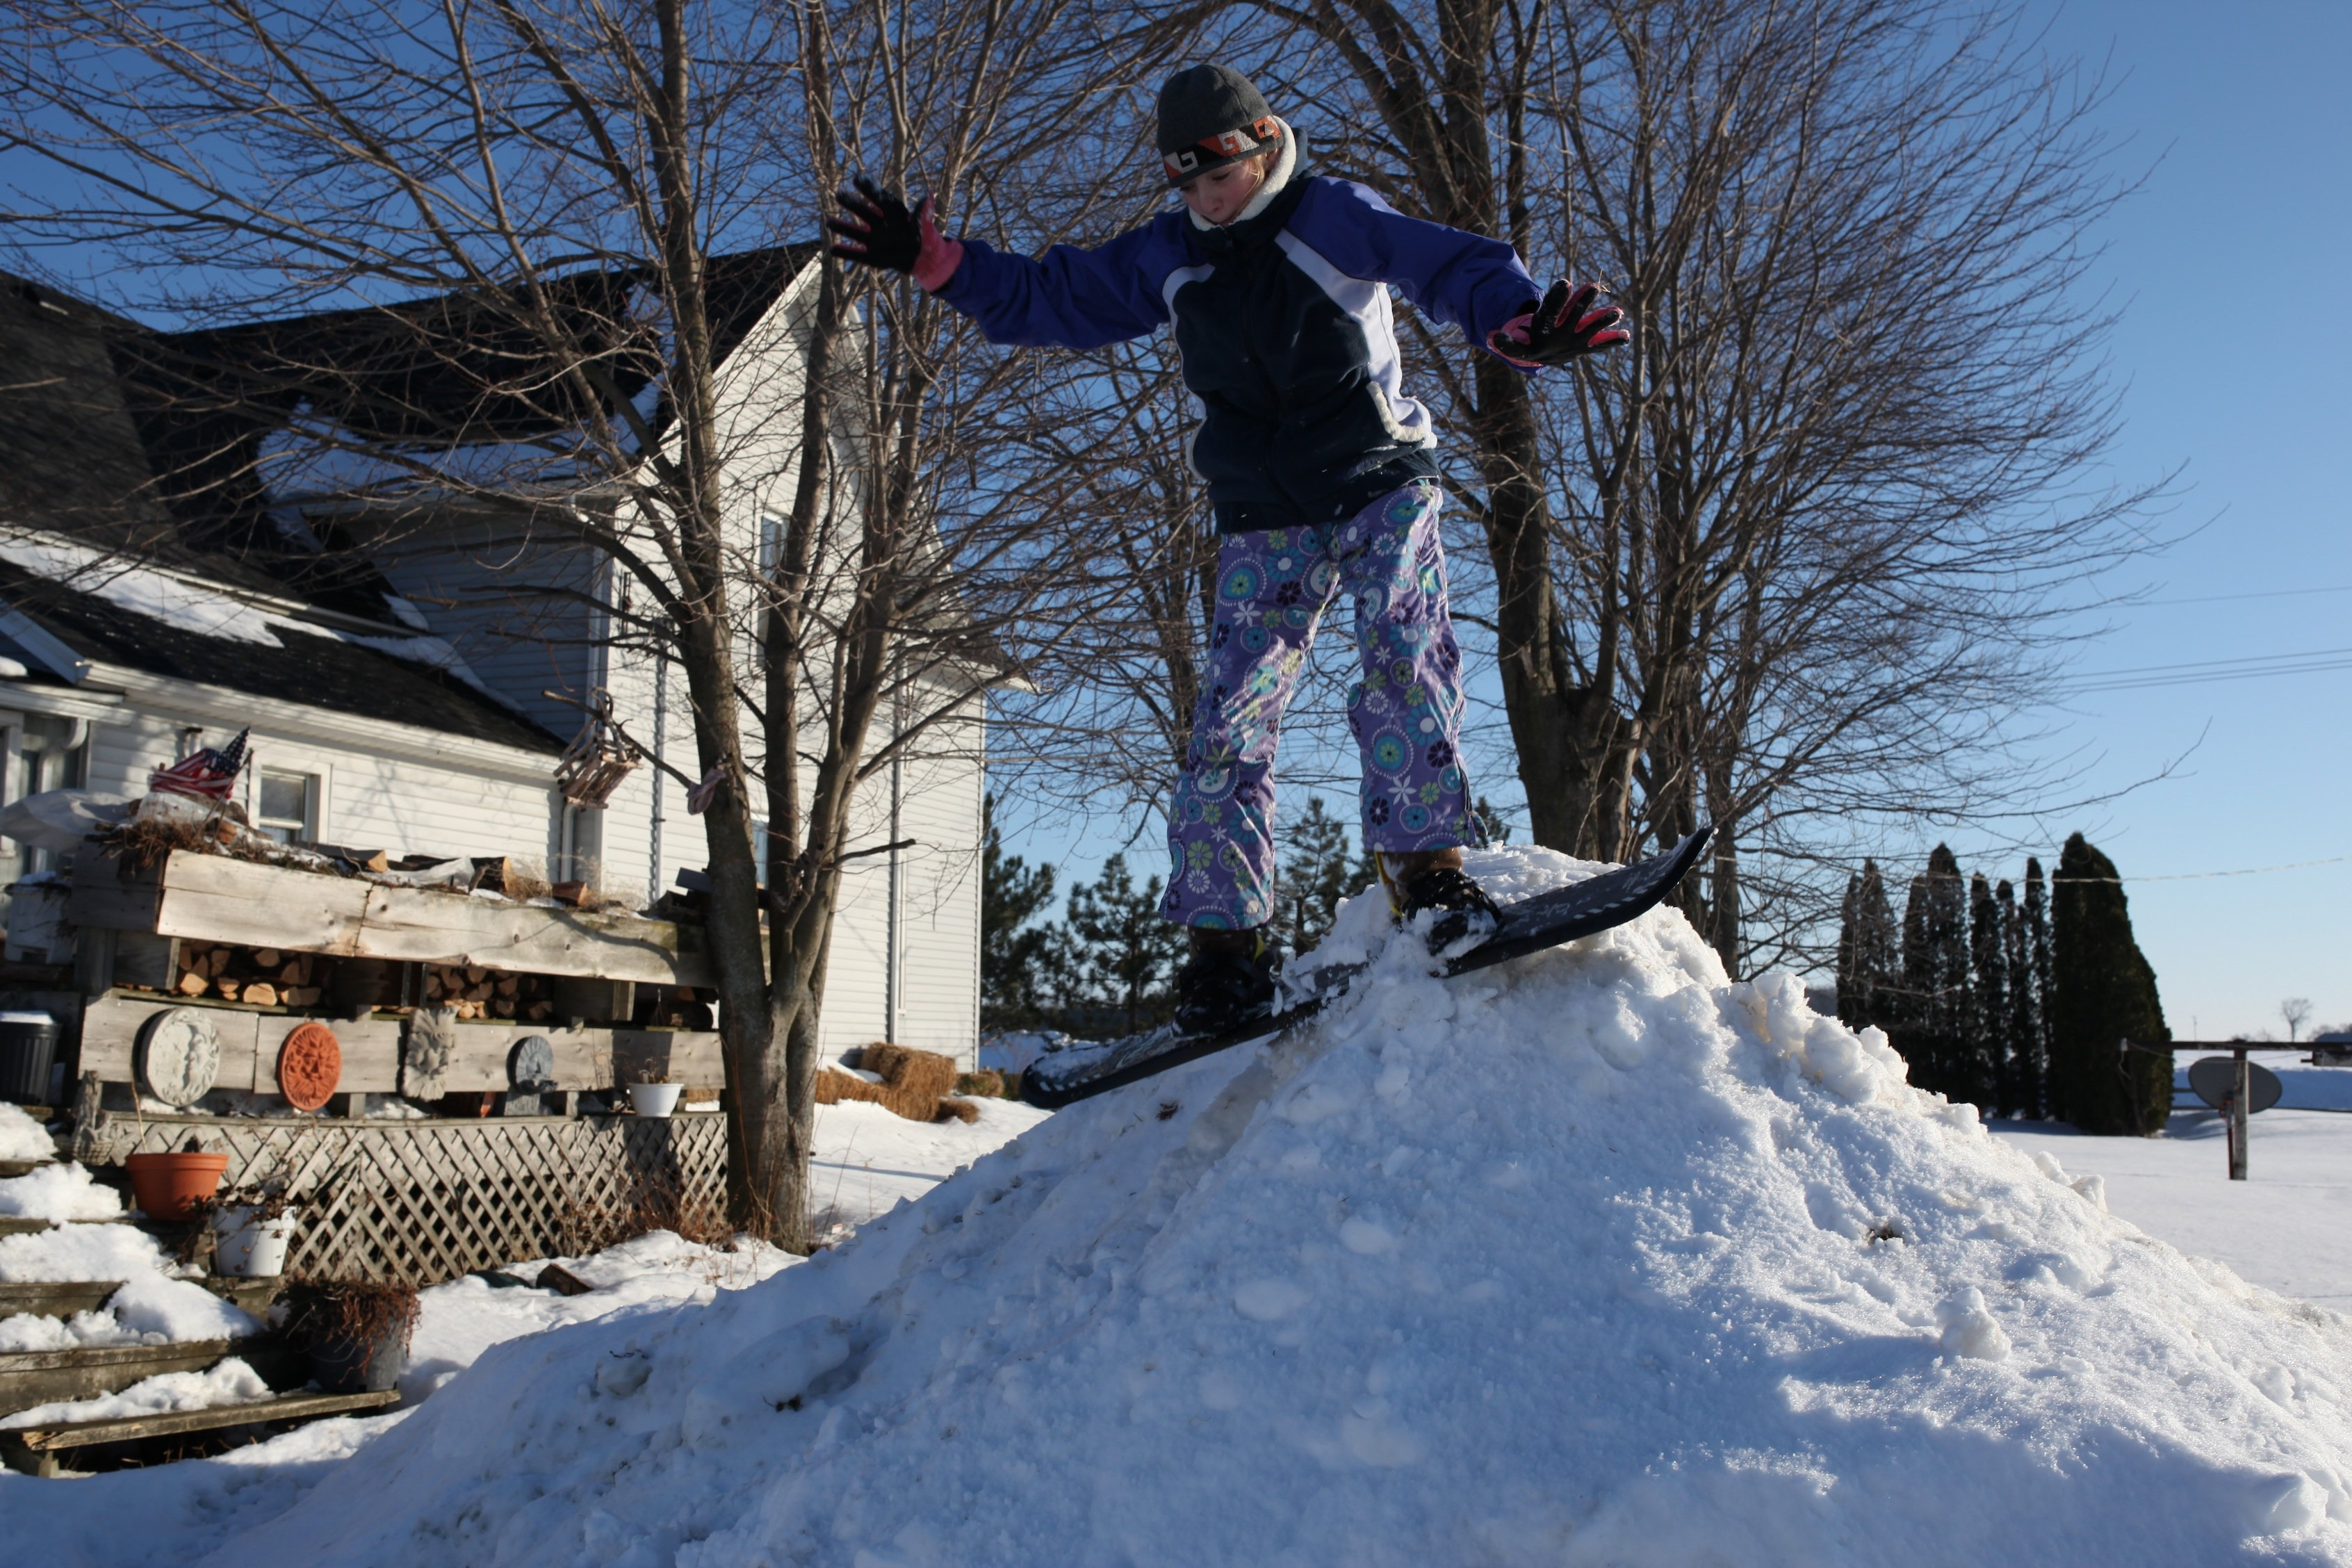 snowboarding #2